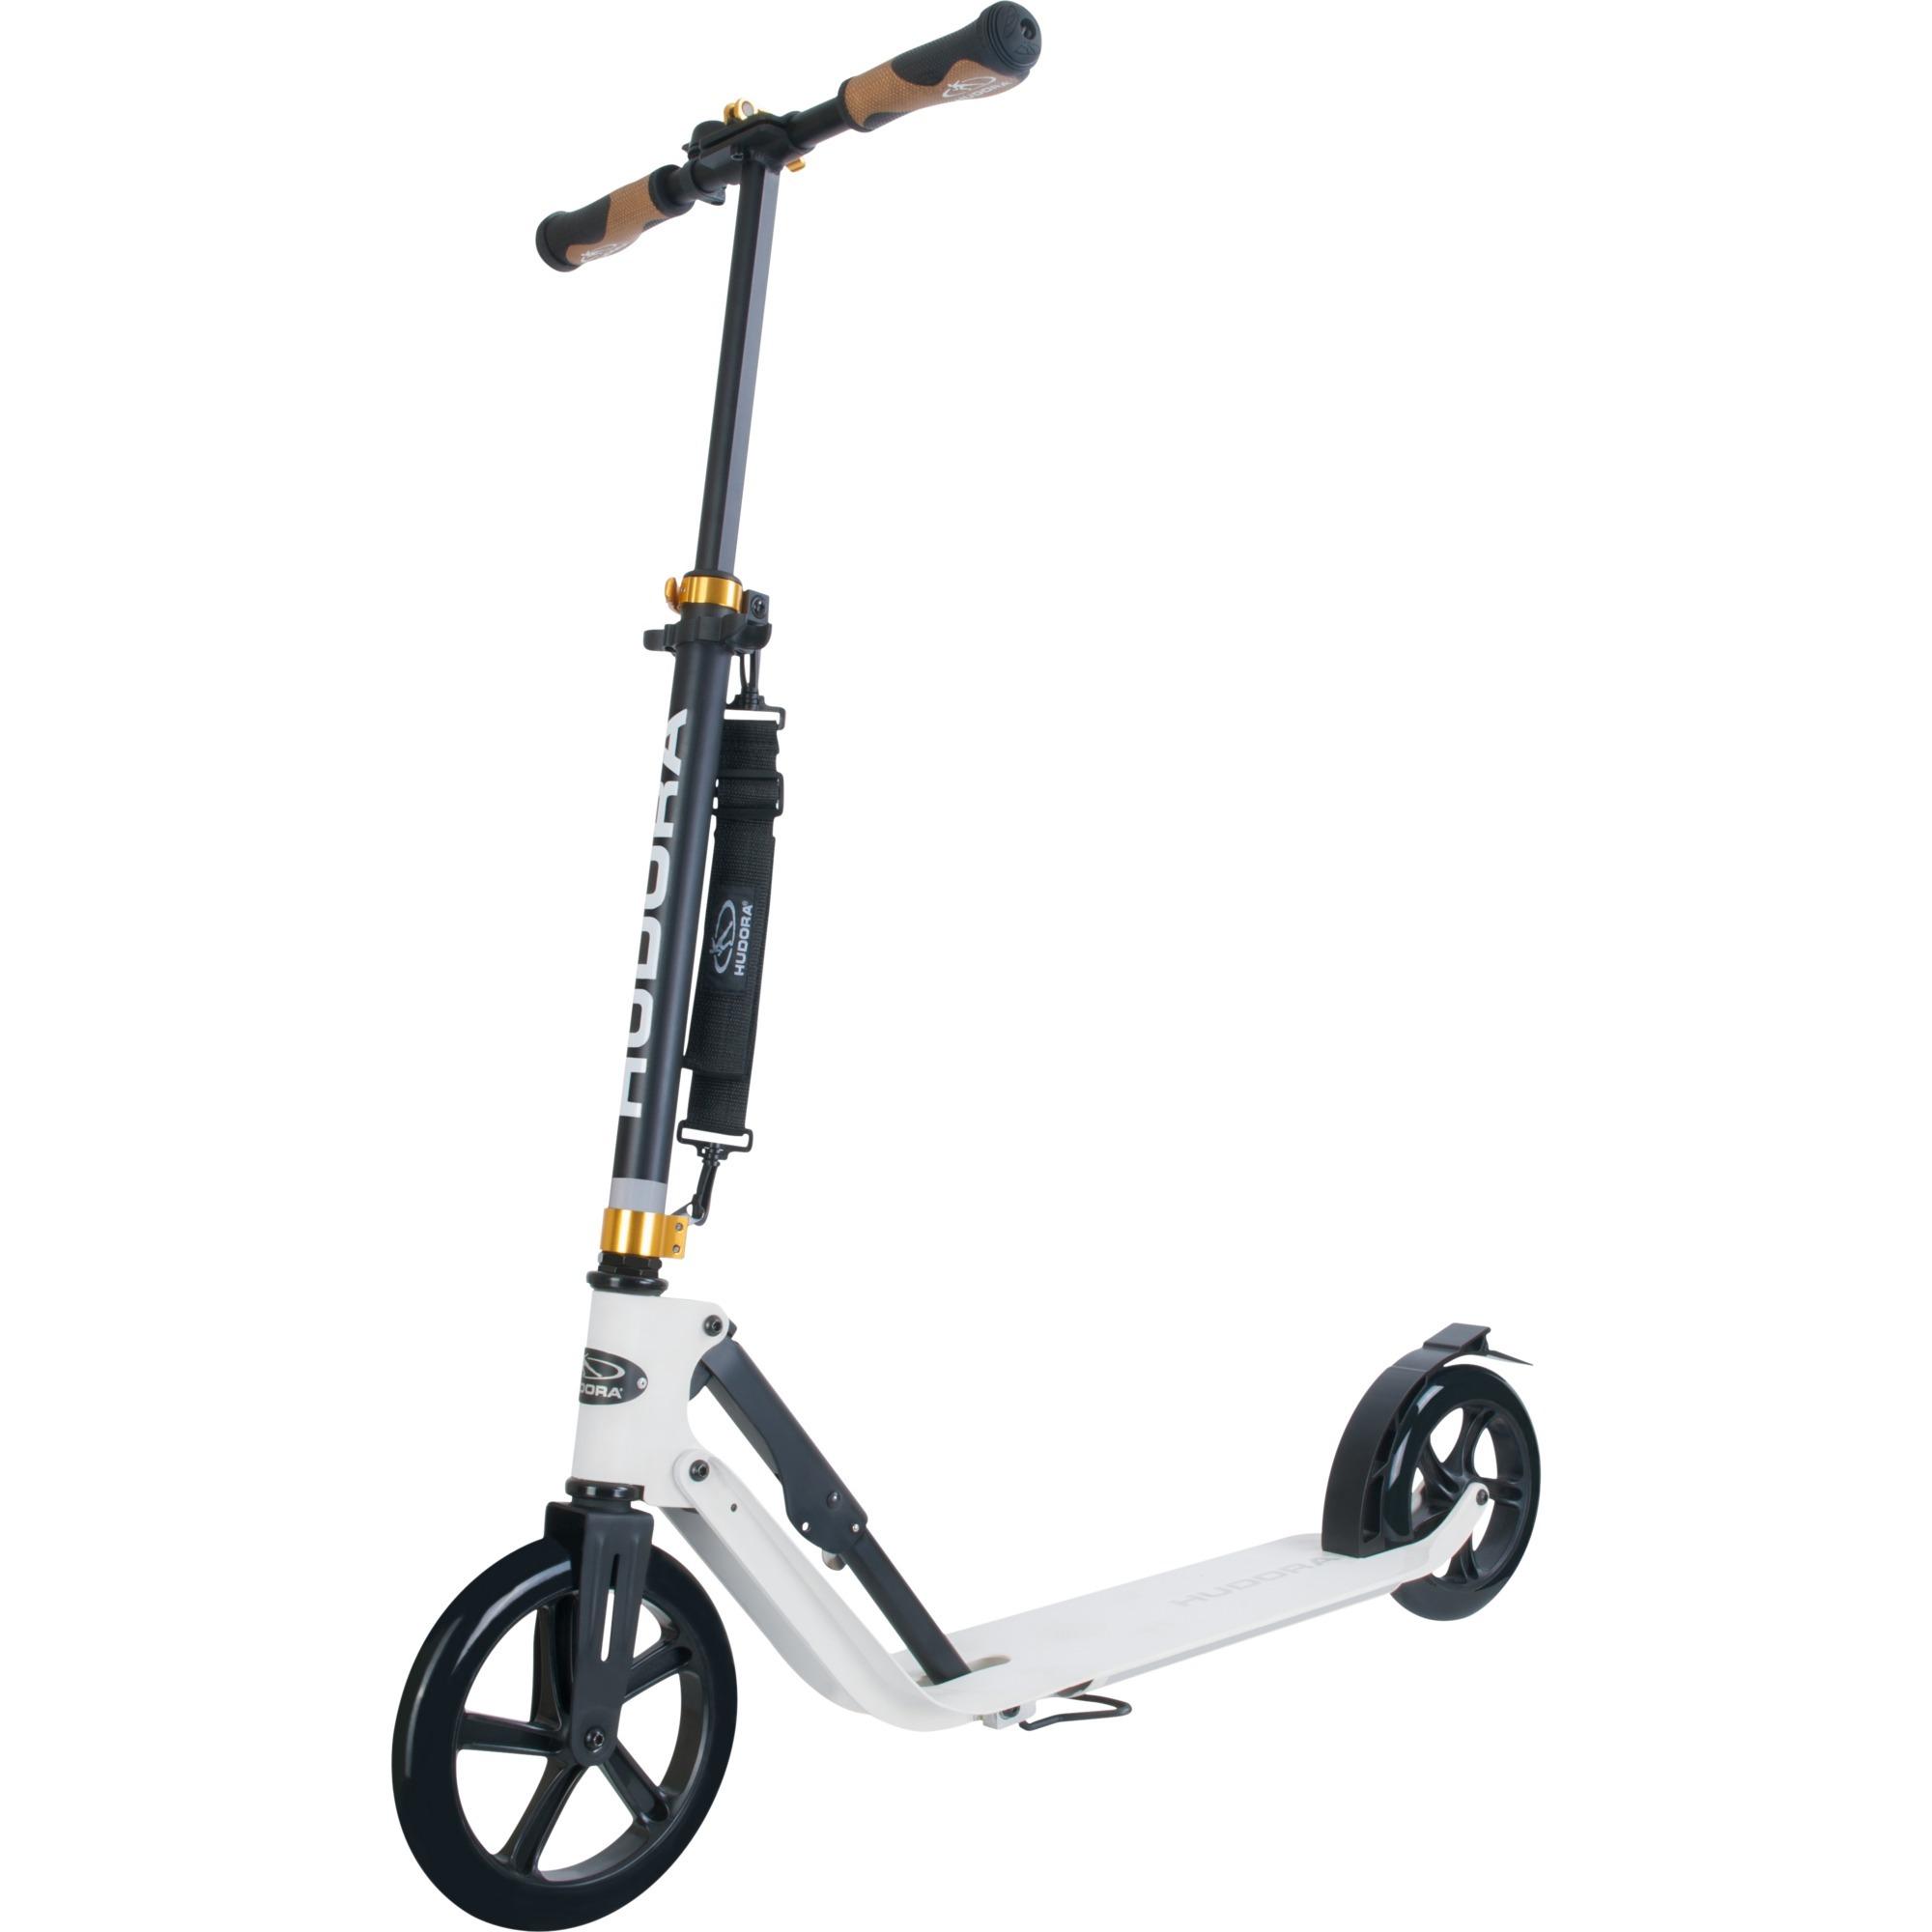 14236 Adultes Noir, Blanc scooter, Trottinette